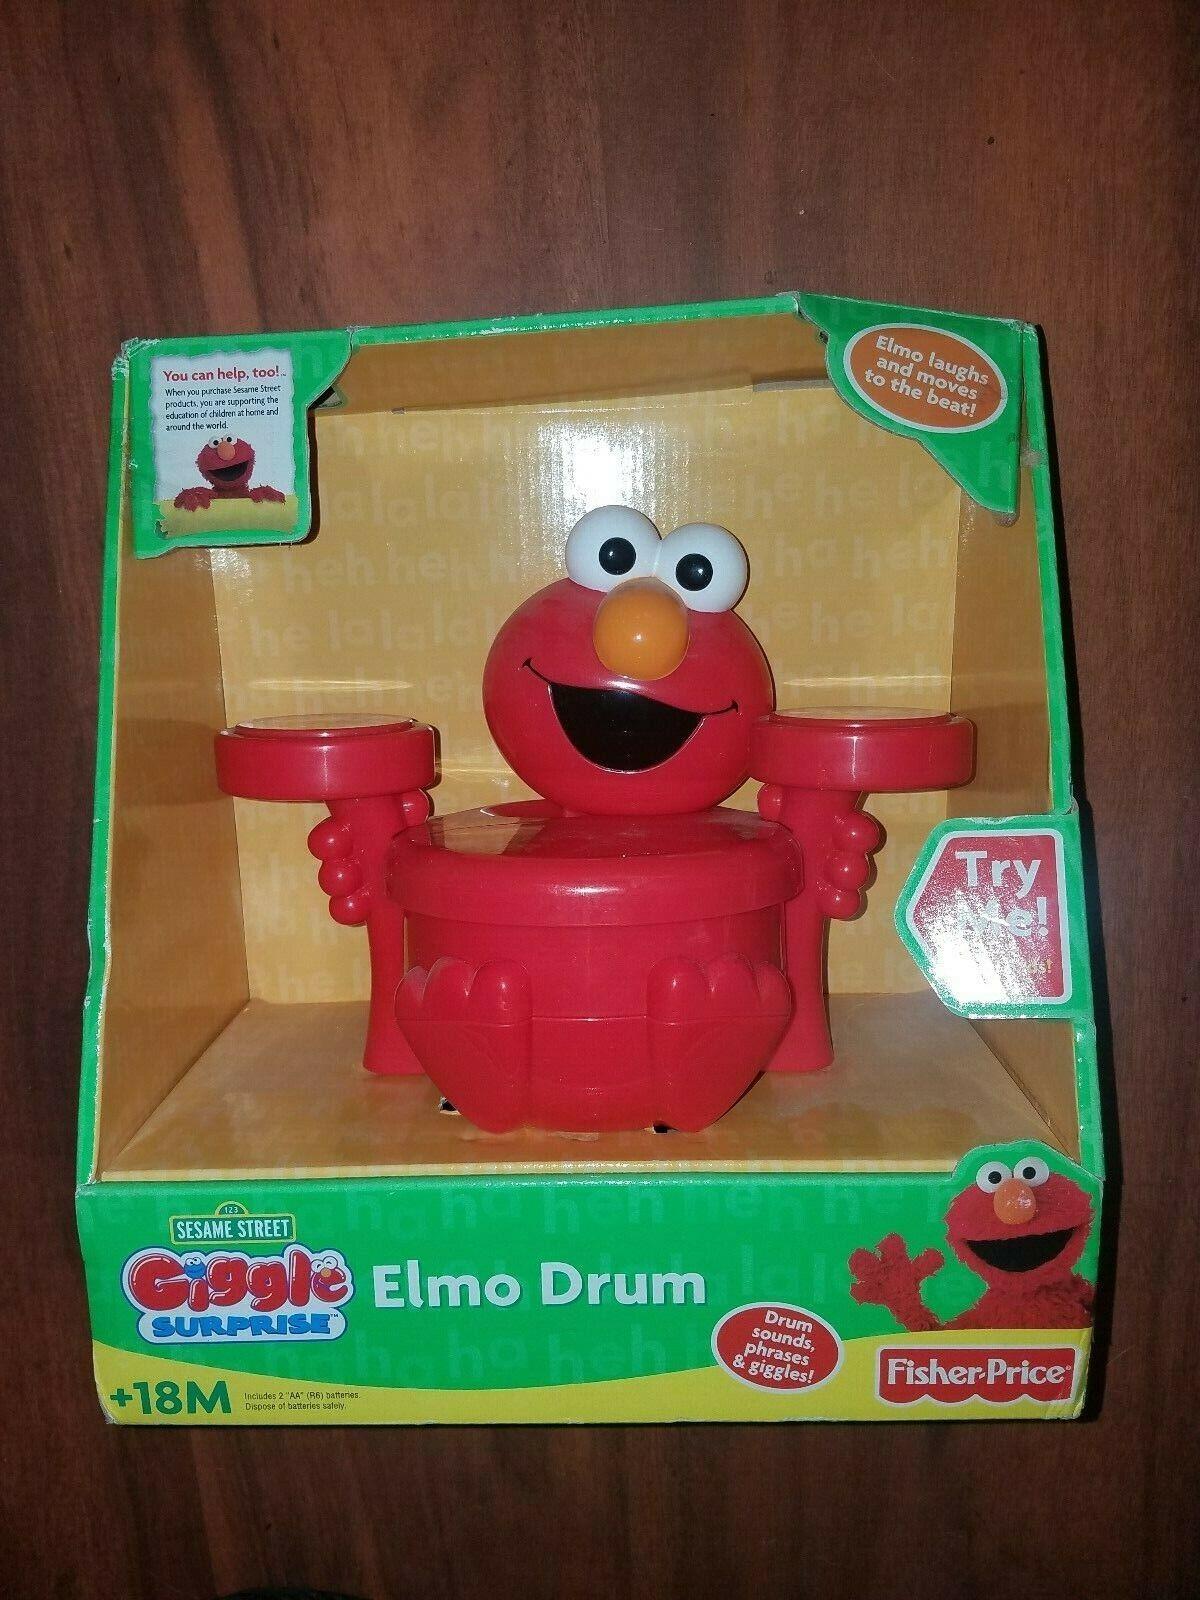 Fisher-Price Sesame Sesame Sesame Street Giggle Surprise Elmo Drum new 2007 fast free shipping a4385e